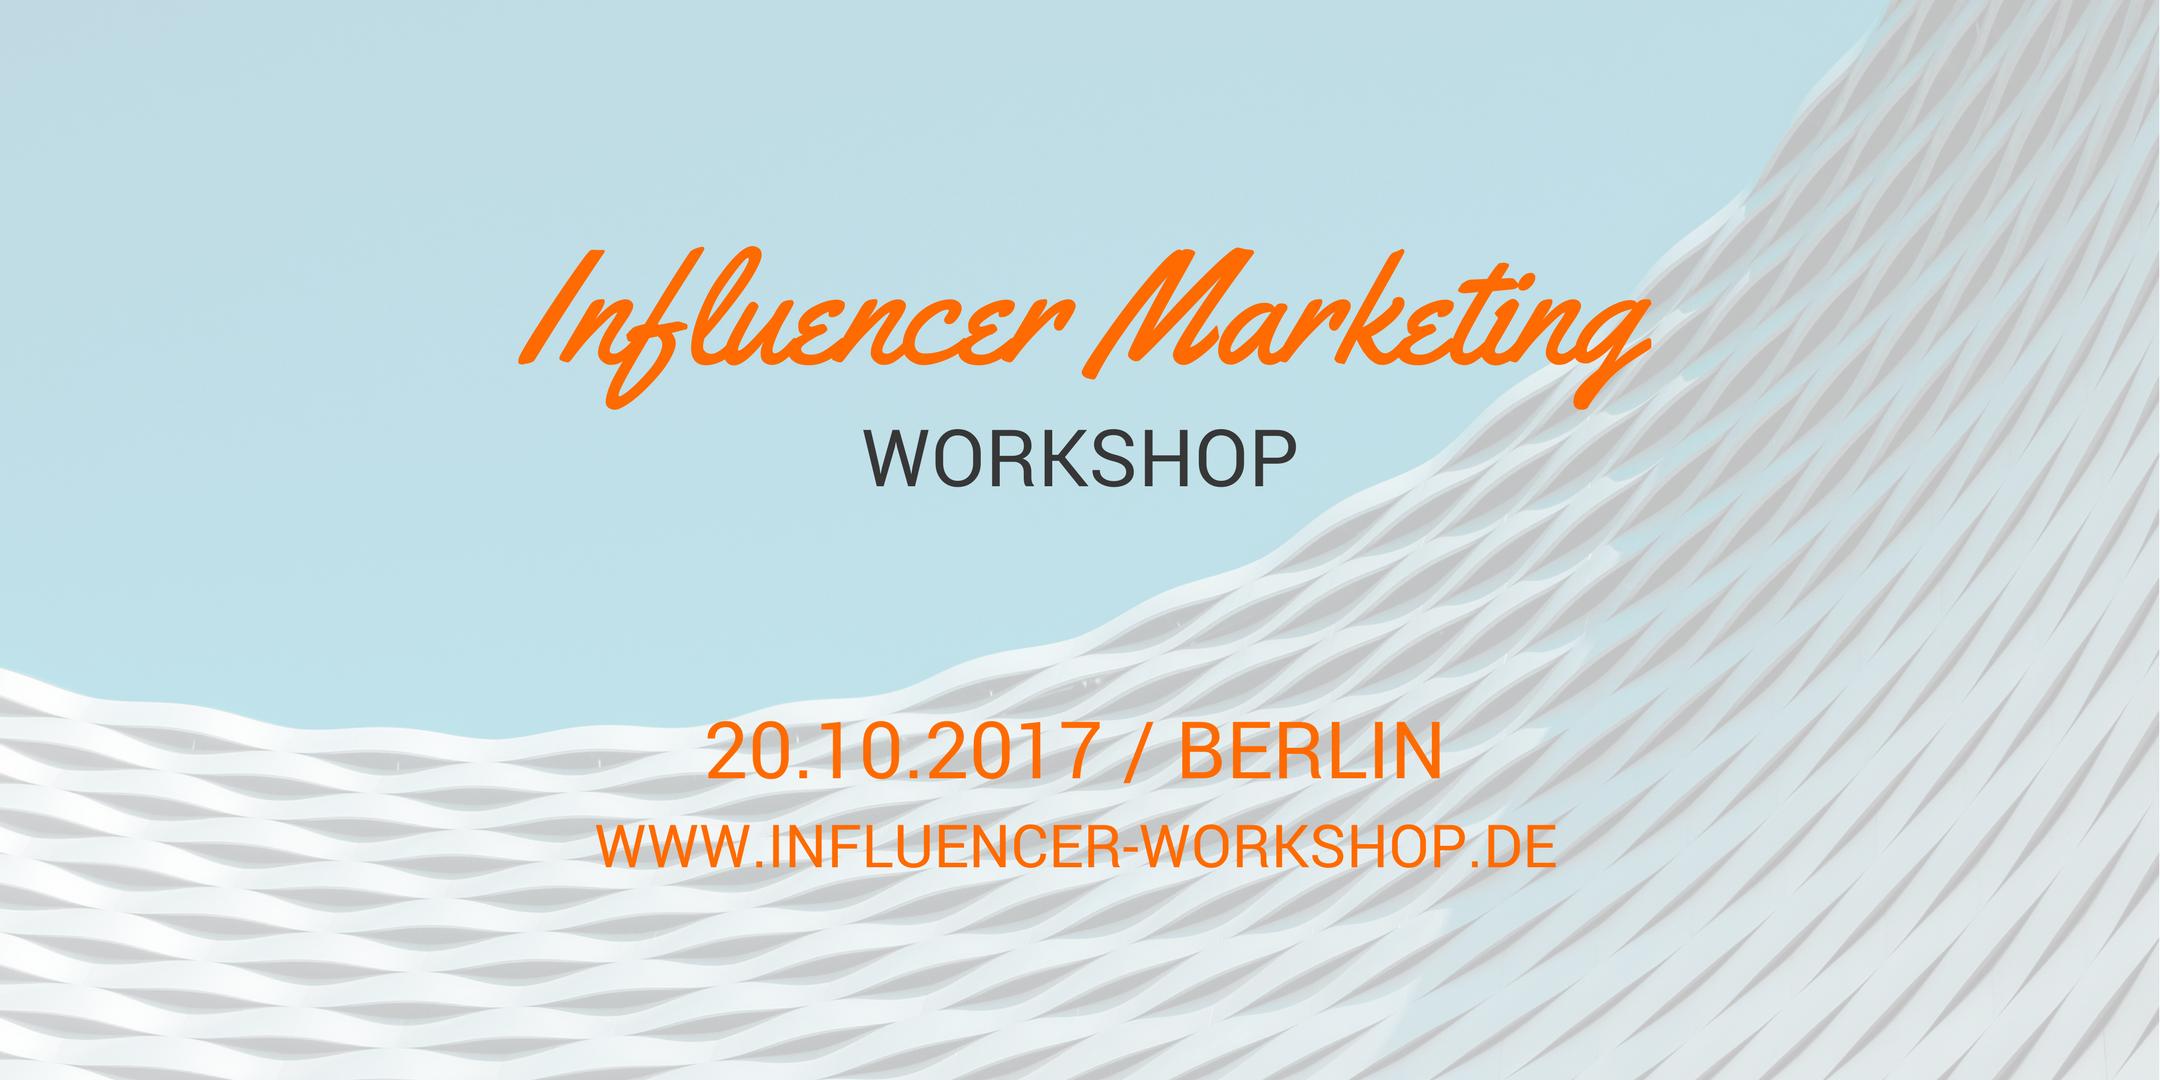 Influencer Marketing Workshop by Influry